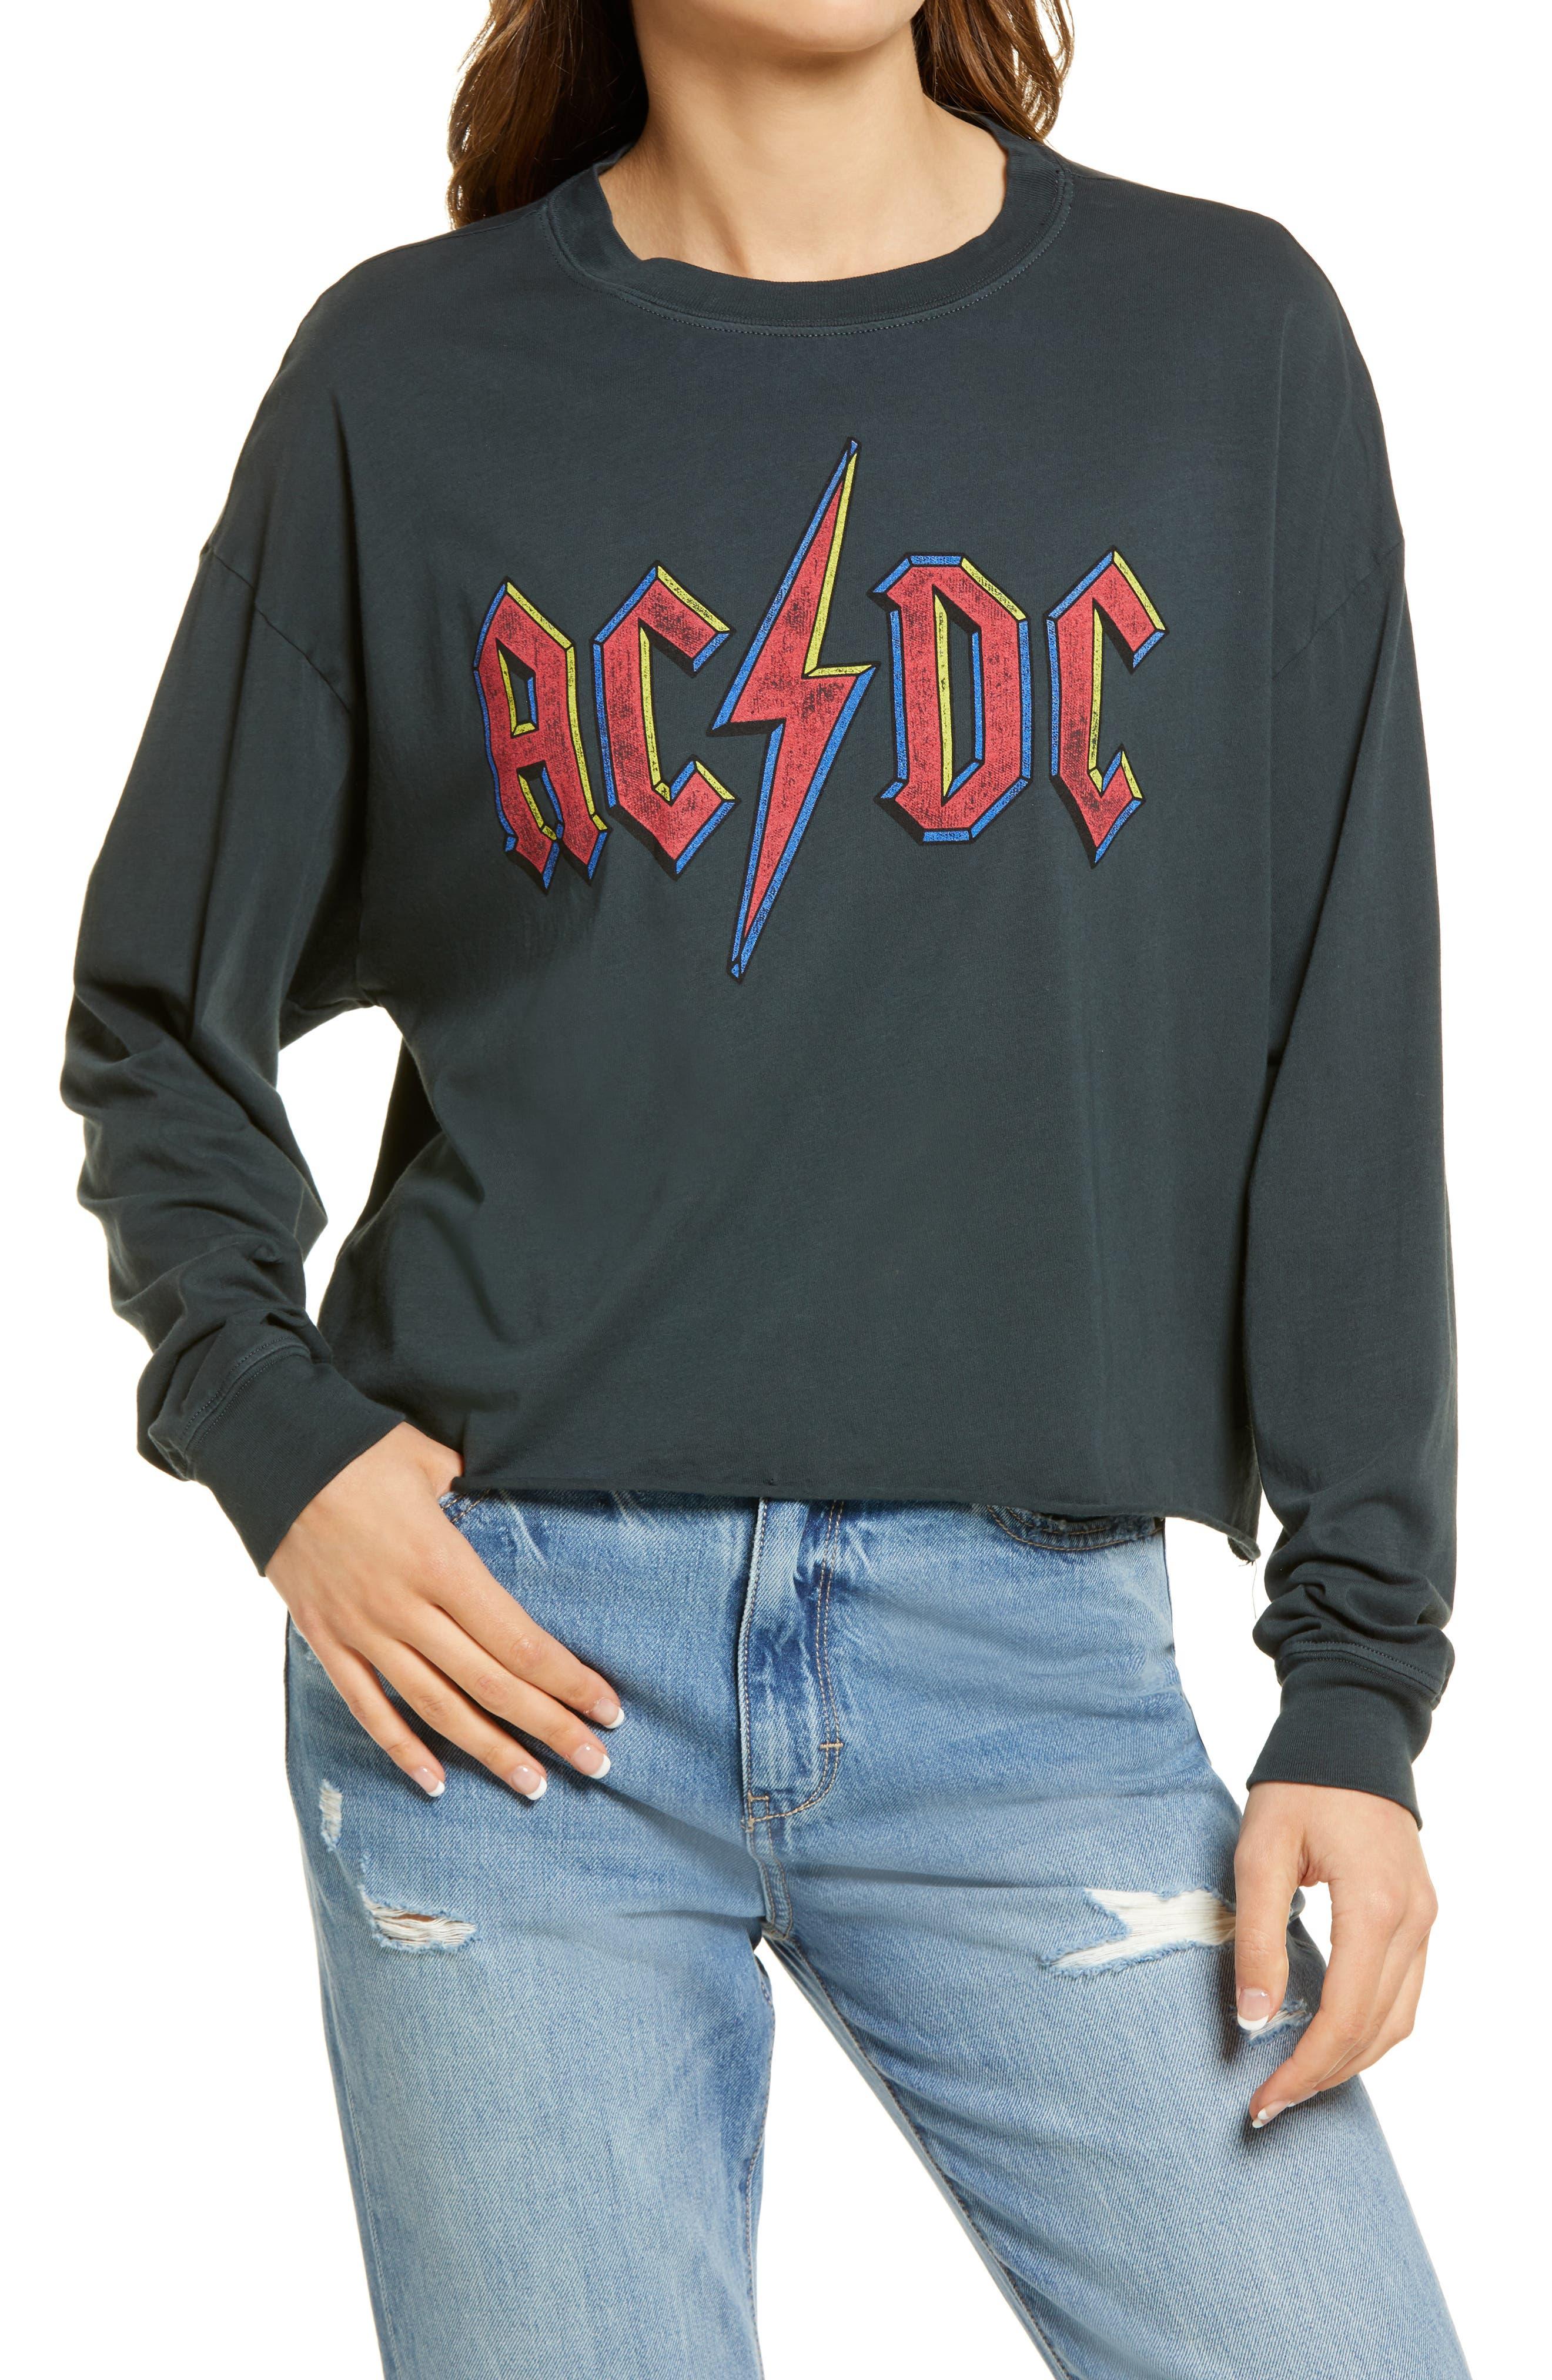 Ac/dc Crop Graphic Sweatshirt